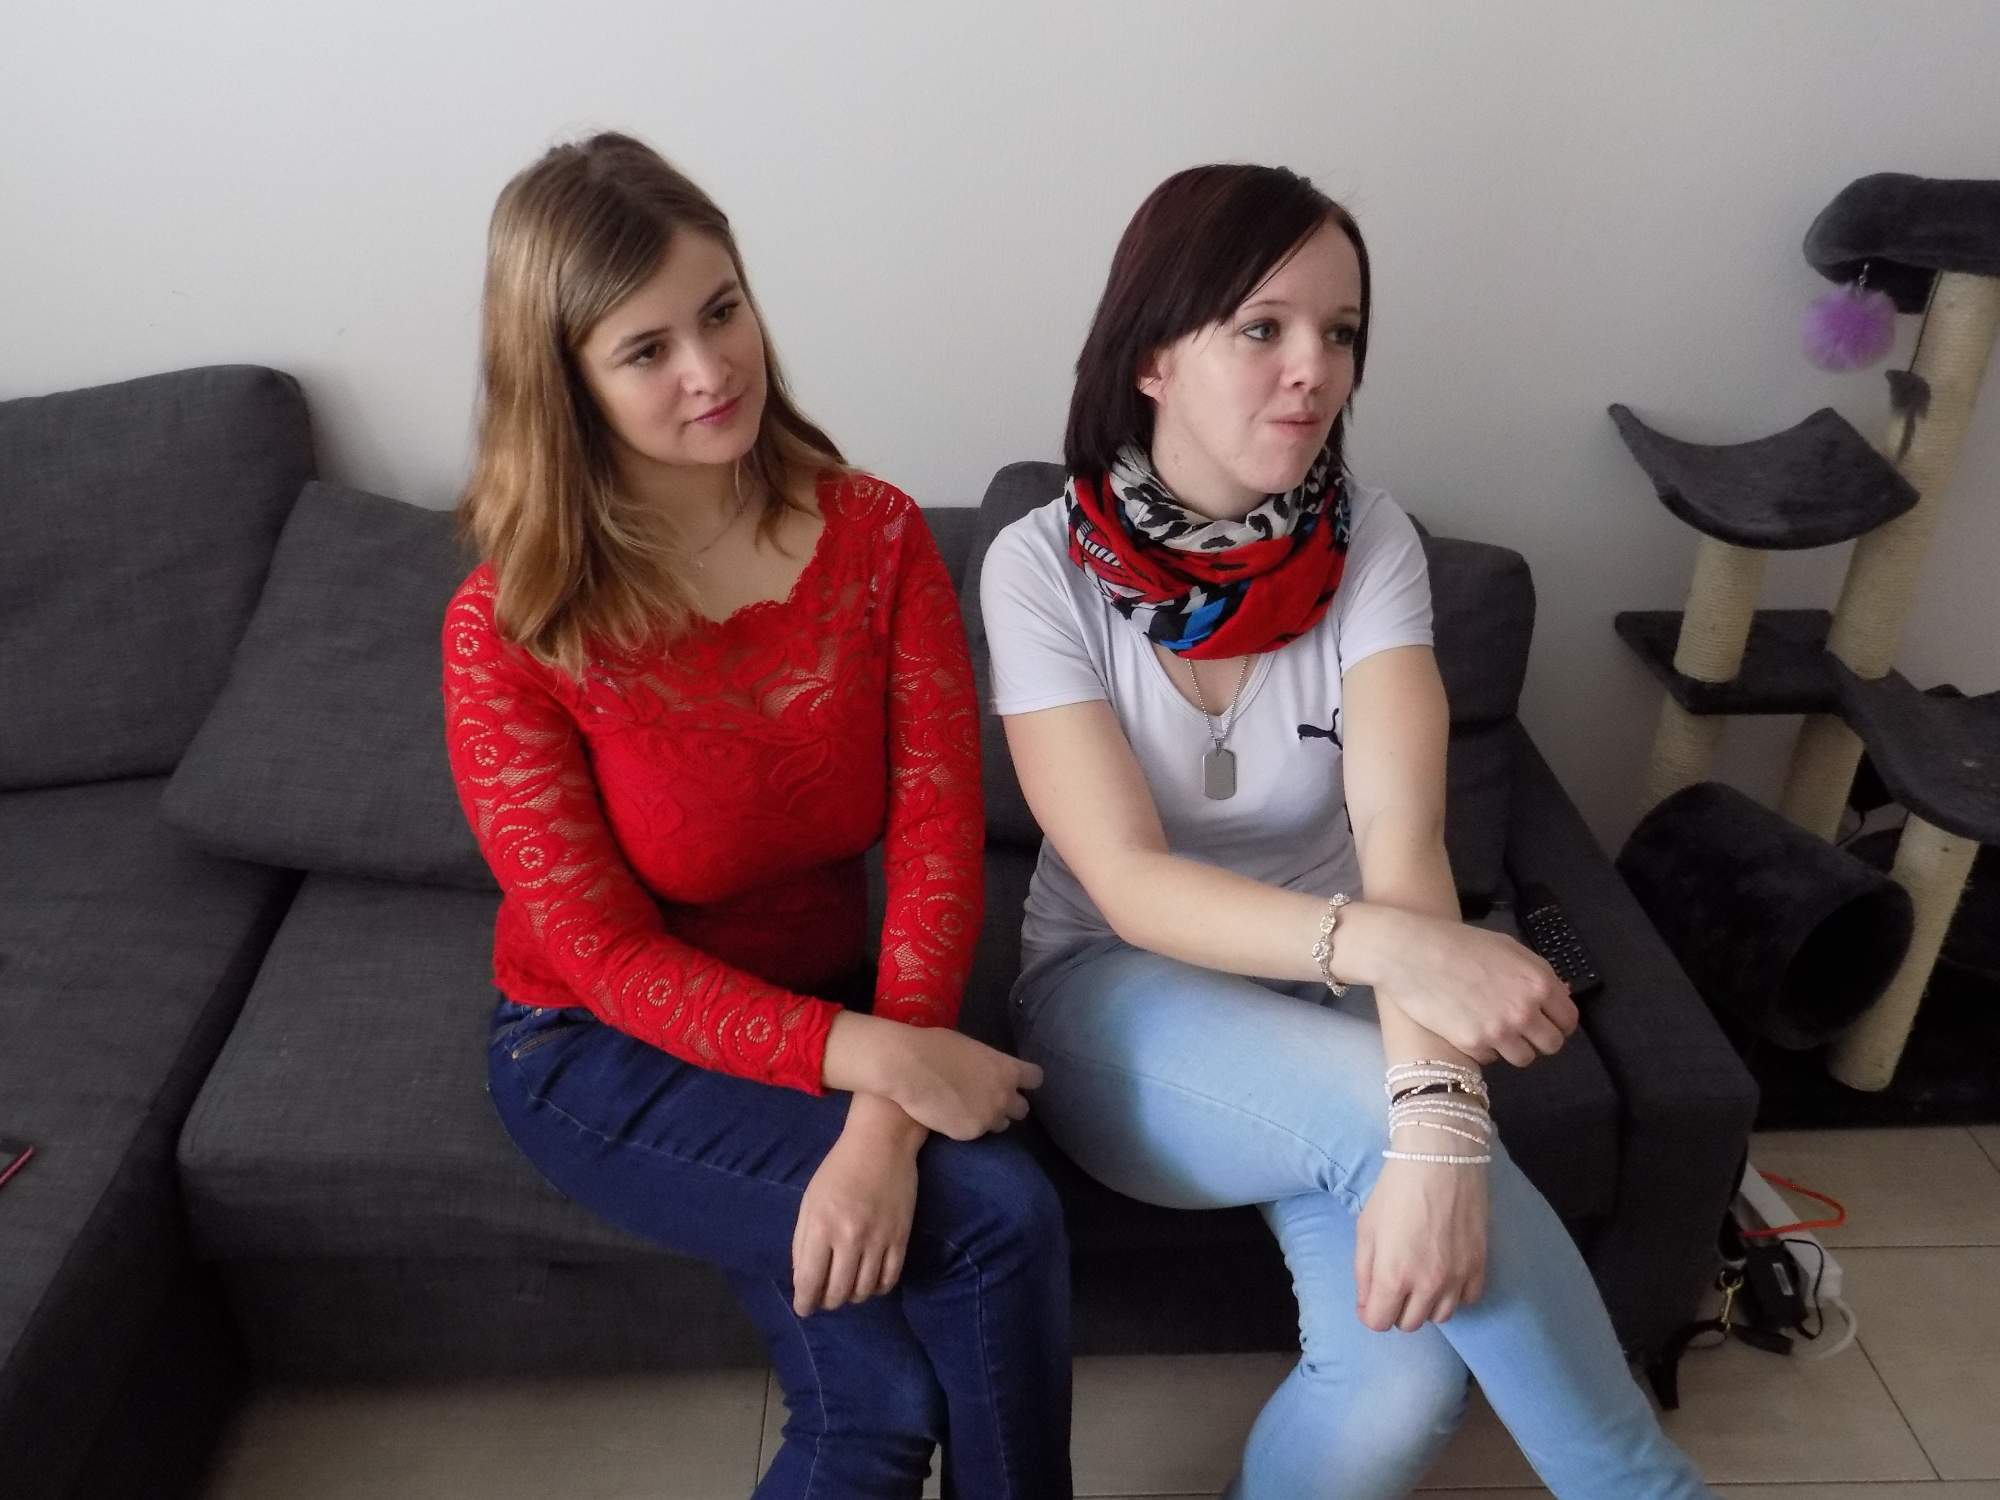 http://img25.rajce.idnes.cz/d2502/13/13862/13862137_c5559384bb63a400f5d8327efbaafba8/images/DSCN1507.jpg